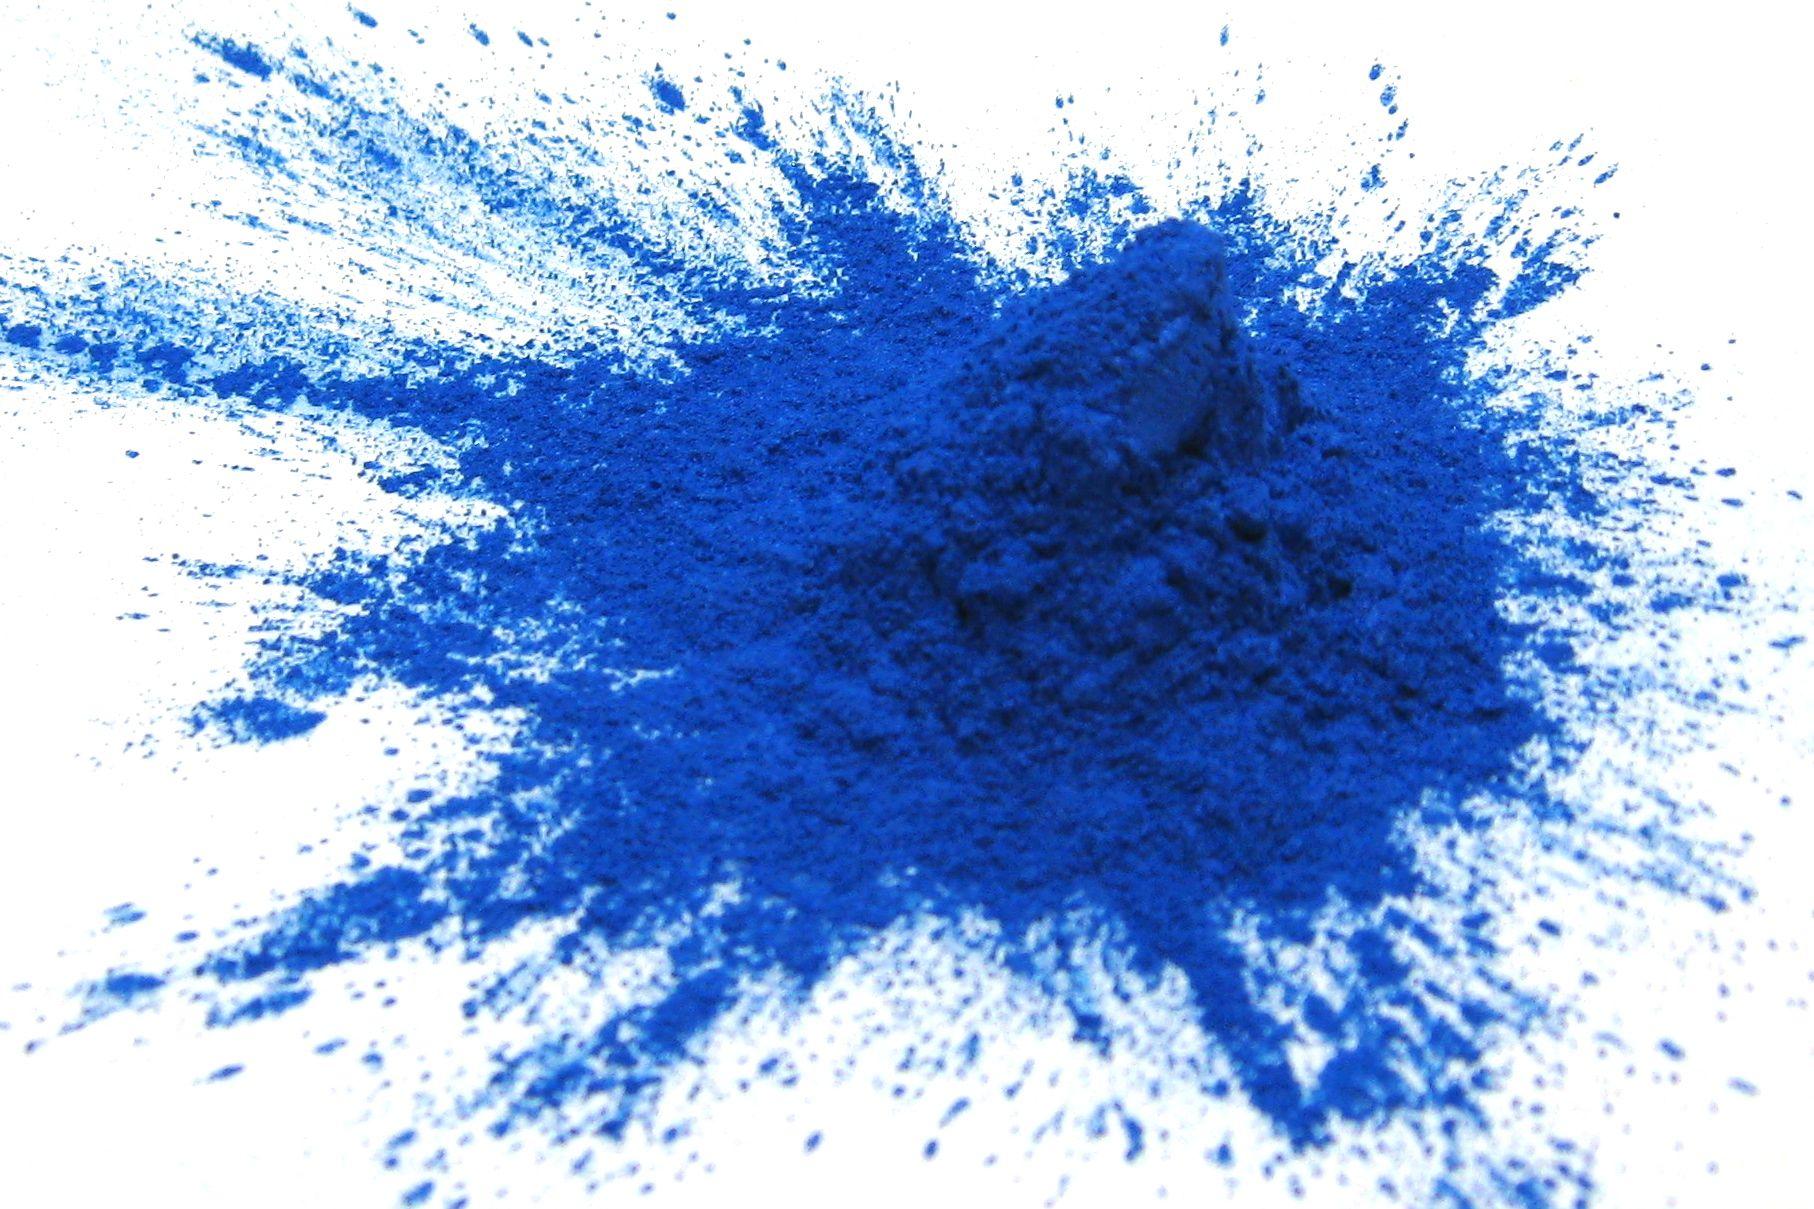 Cobalt Blue Mica Powder 1oz, Metallic Blue Powder, Cosmetic Grade Mica ...